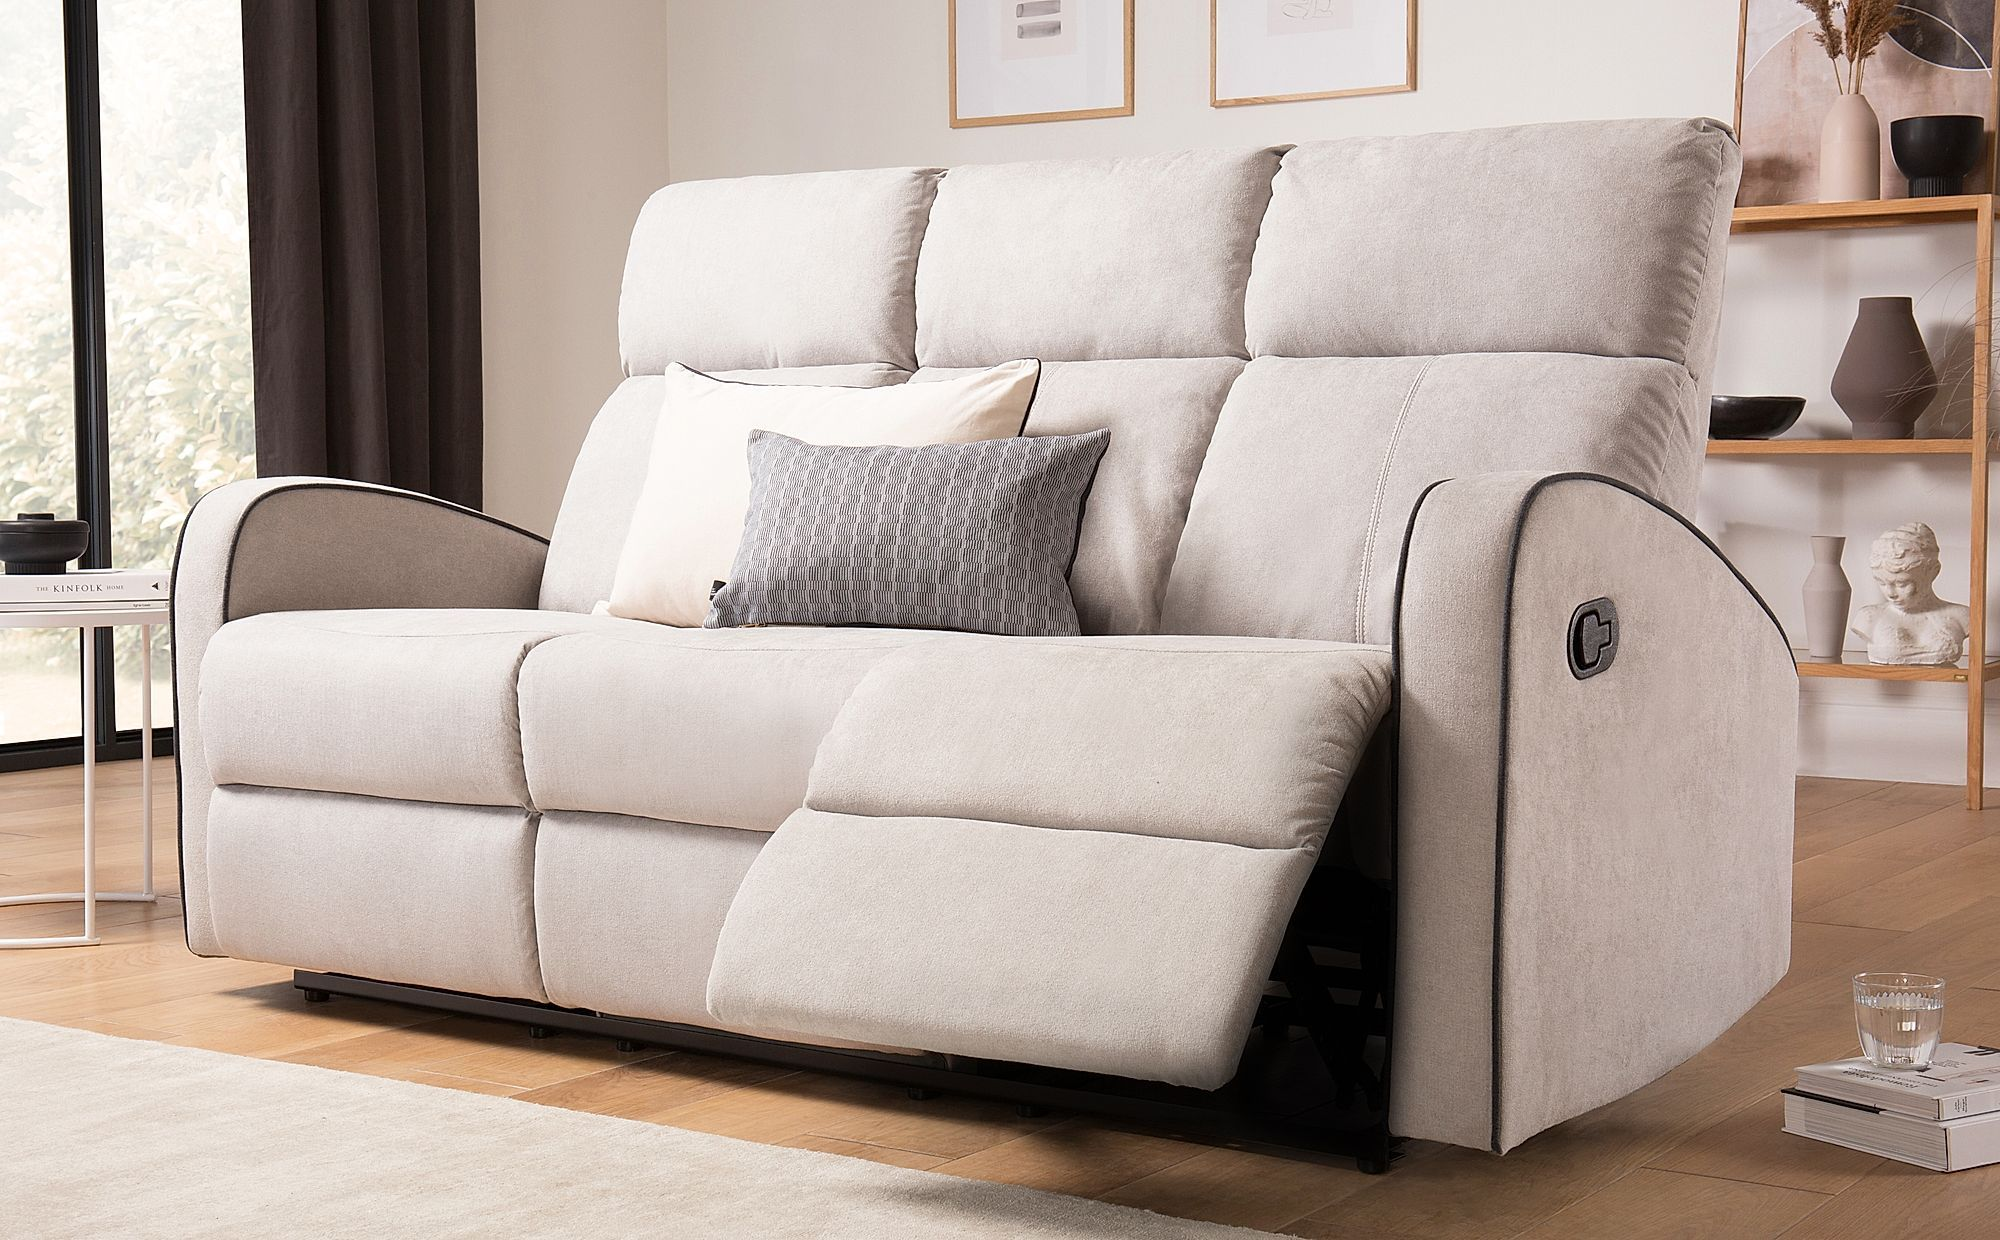 Ashby Dove Grey Plush Fabric 3 Seater Recliner Sofa Reclining